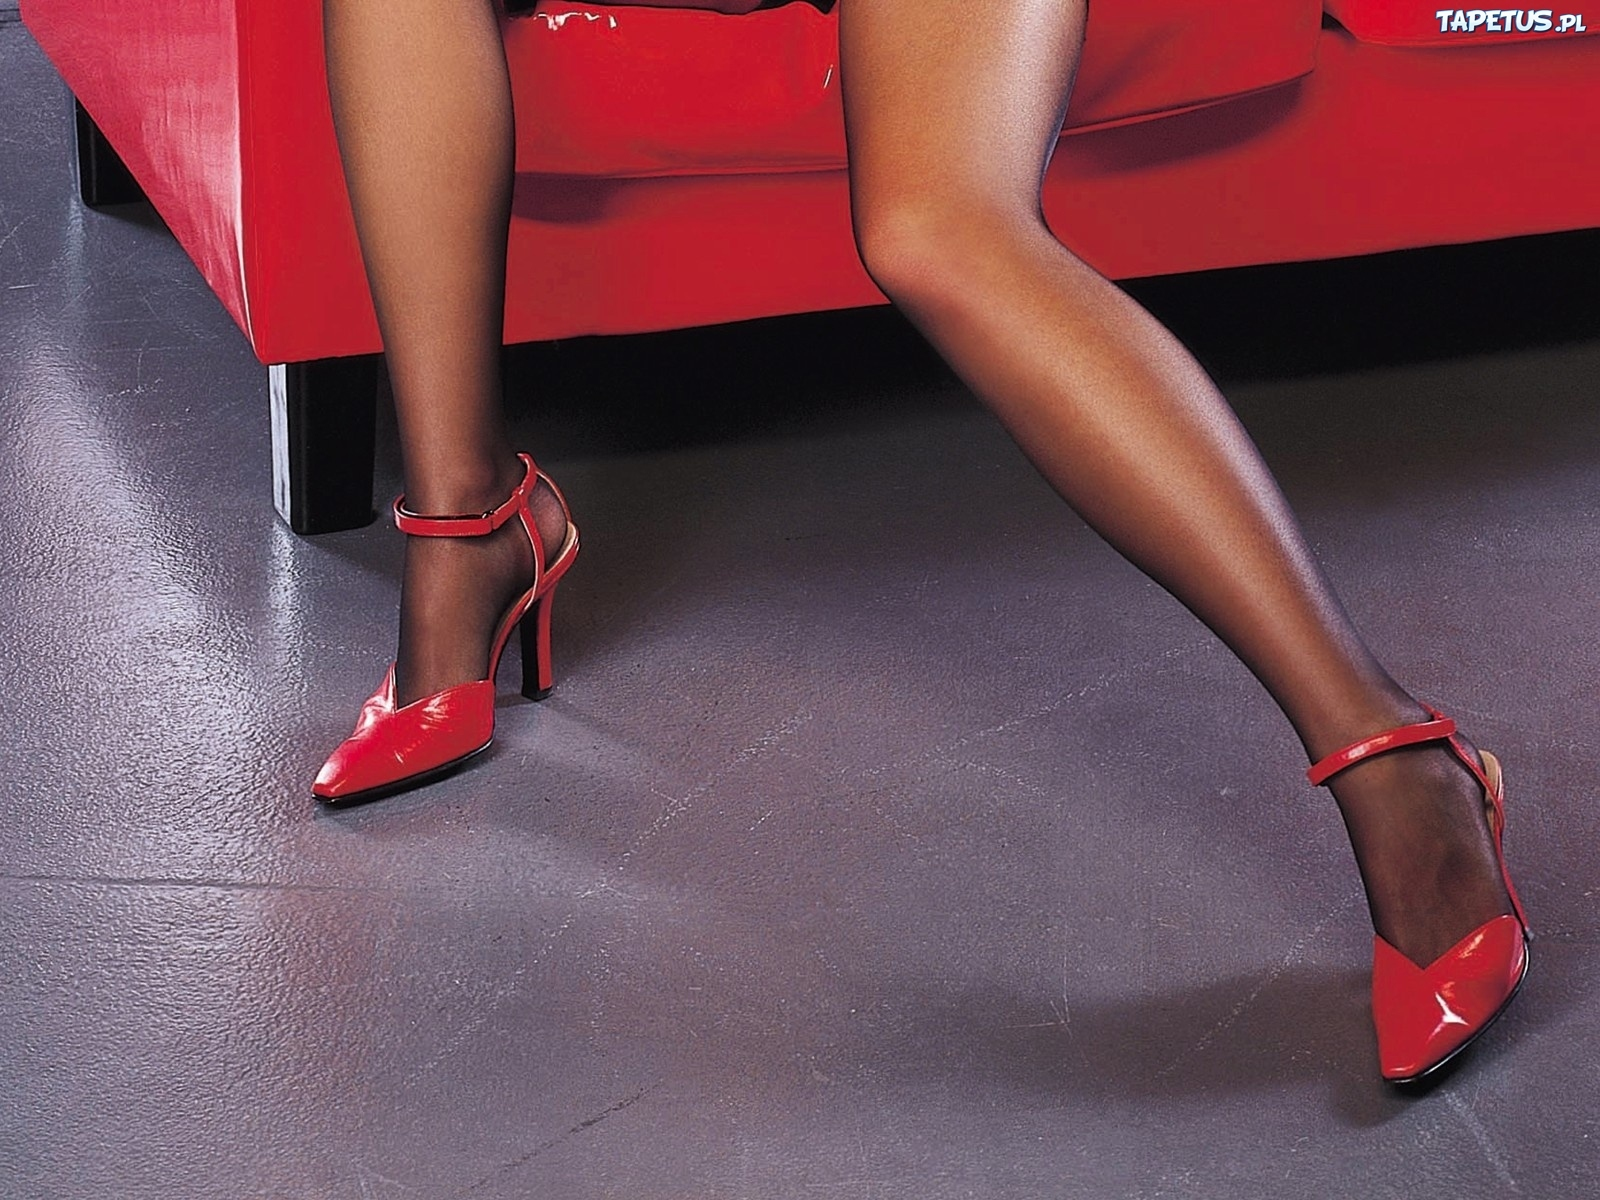 161419_kobiece-nogi-szpilki-podloga